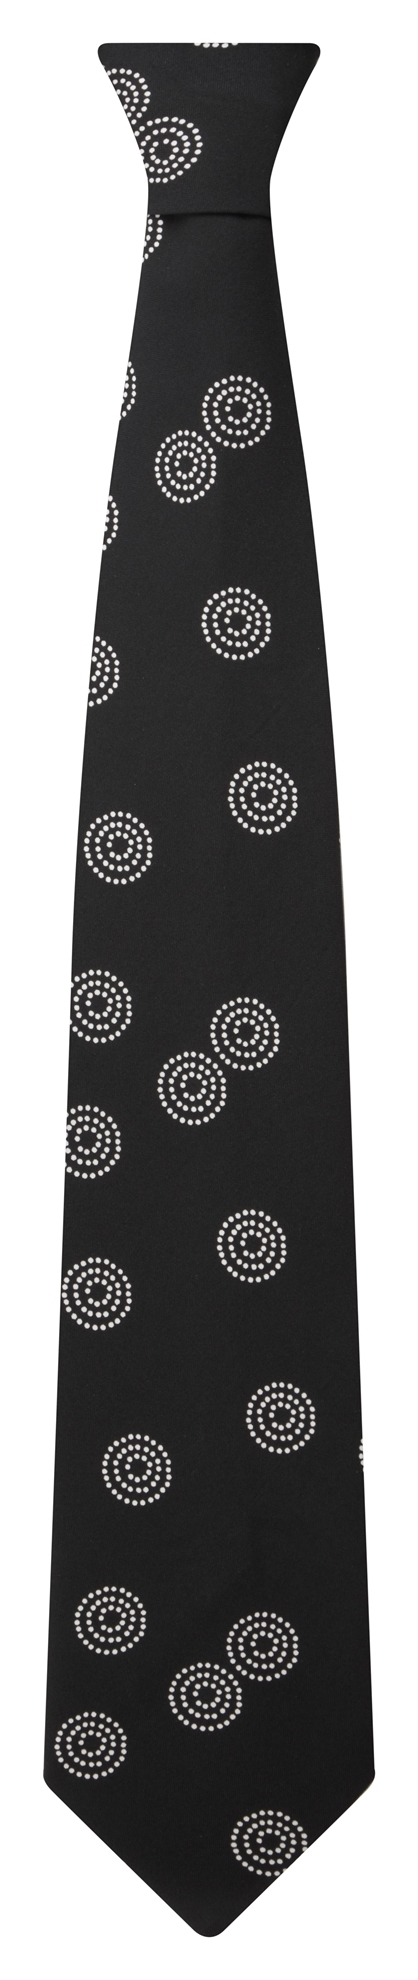 Picture of Print Tie - Black/White Sienna Print